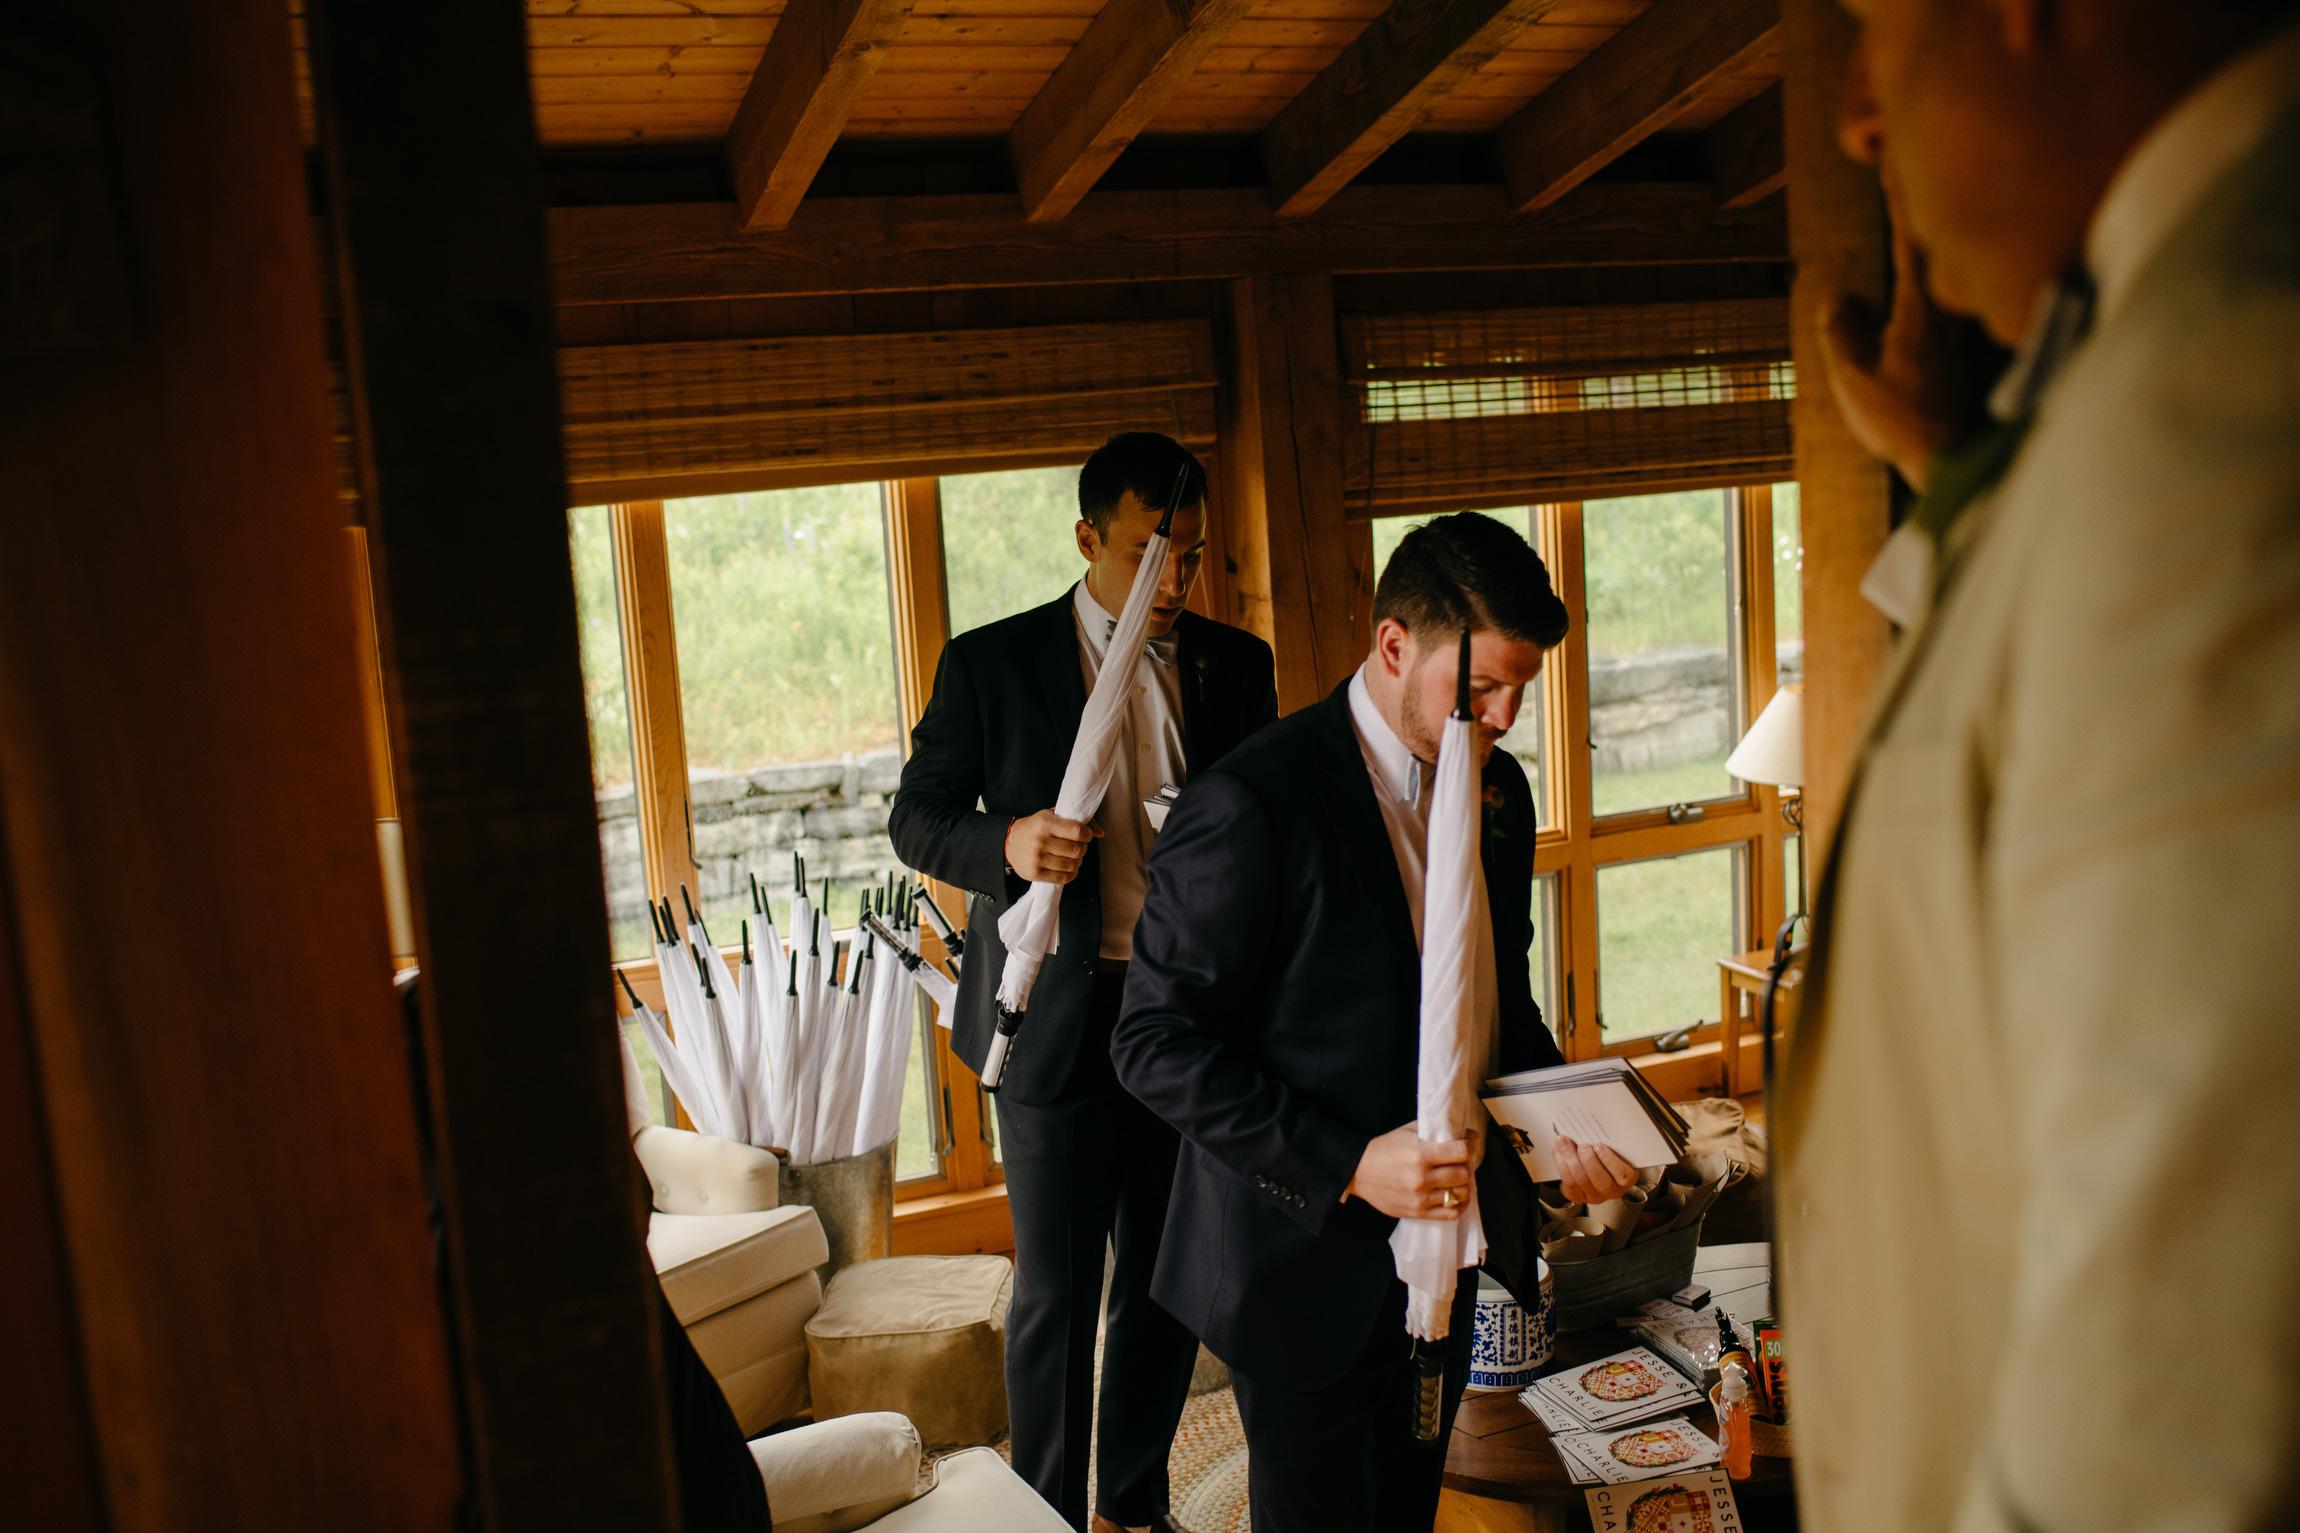 vermont_farm_wedding_photos_mikhail_glabetS_14.JPG